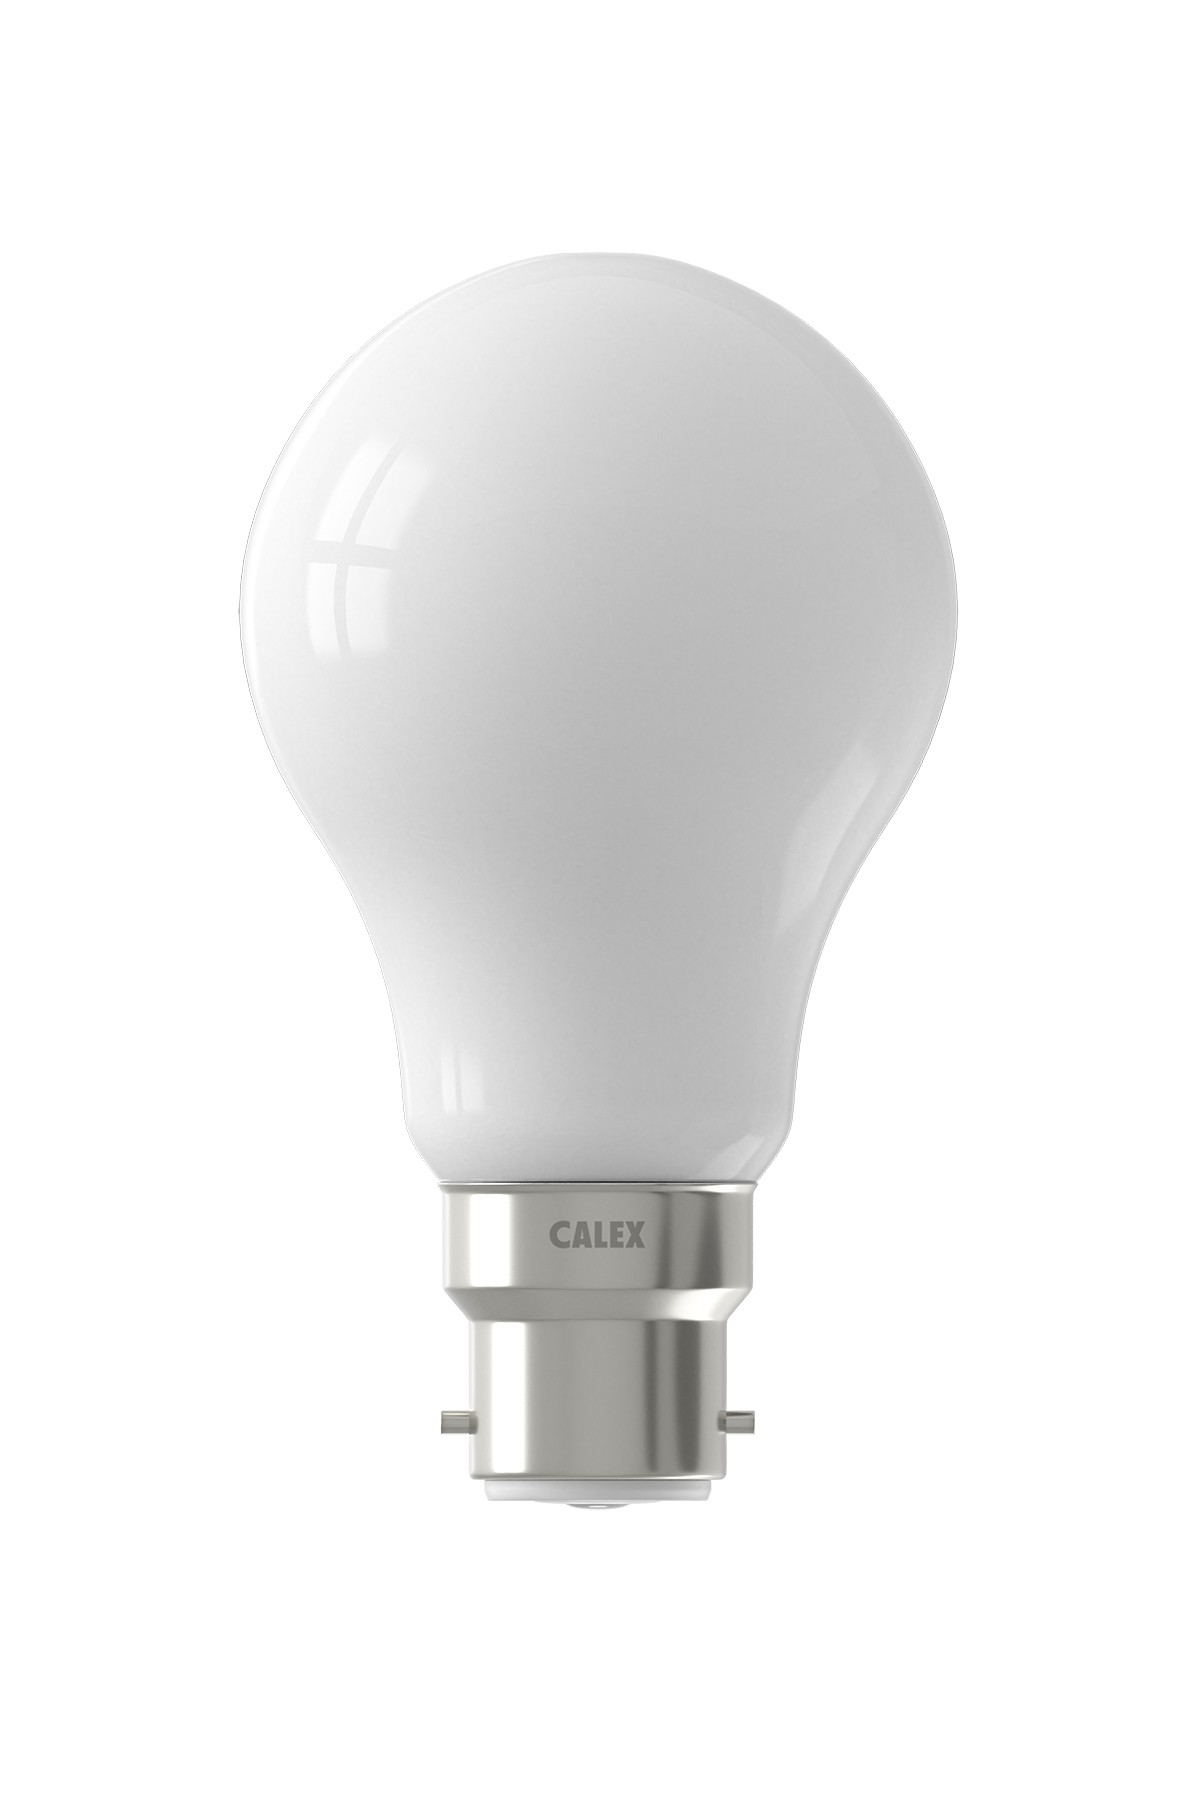 Calex Smart Standaard led lamp 7W 806lm 2200-4000K